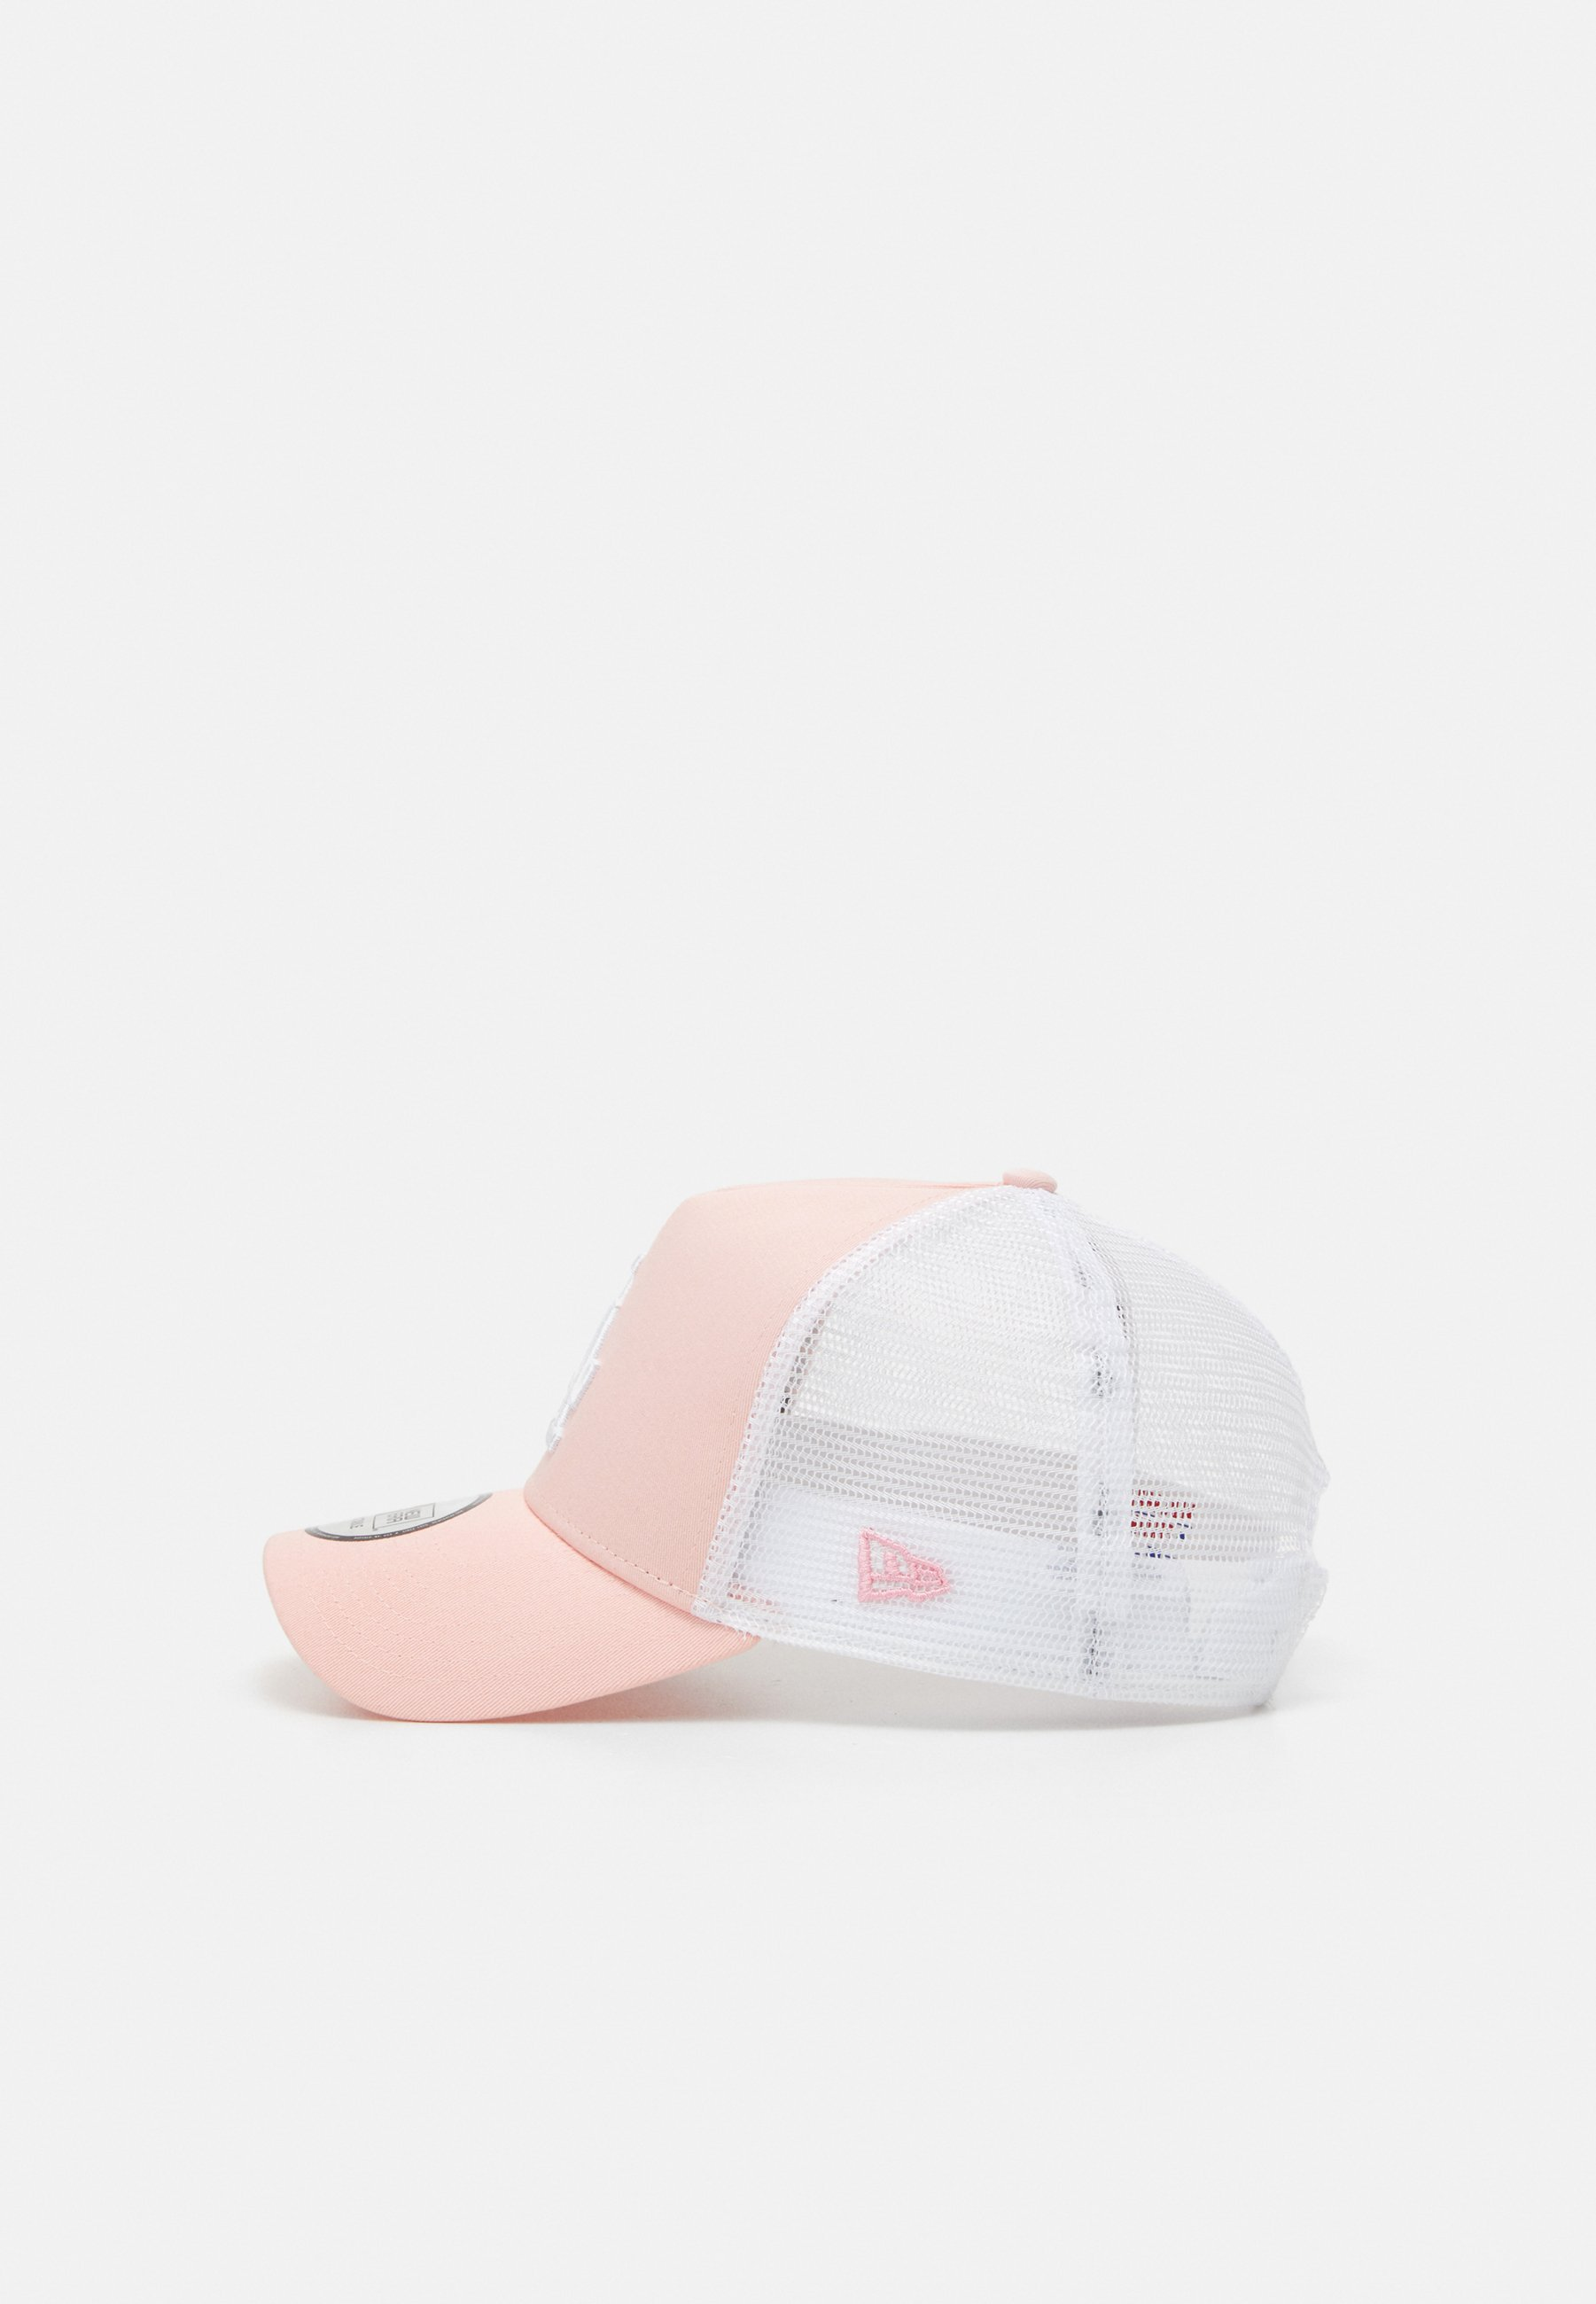 New Era LEAGUE ESSENTIAL TRUCKER - Cap - pink/white/rosa W6srnvtIDfUbwrm